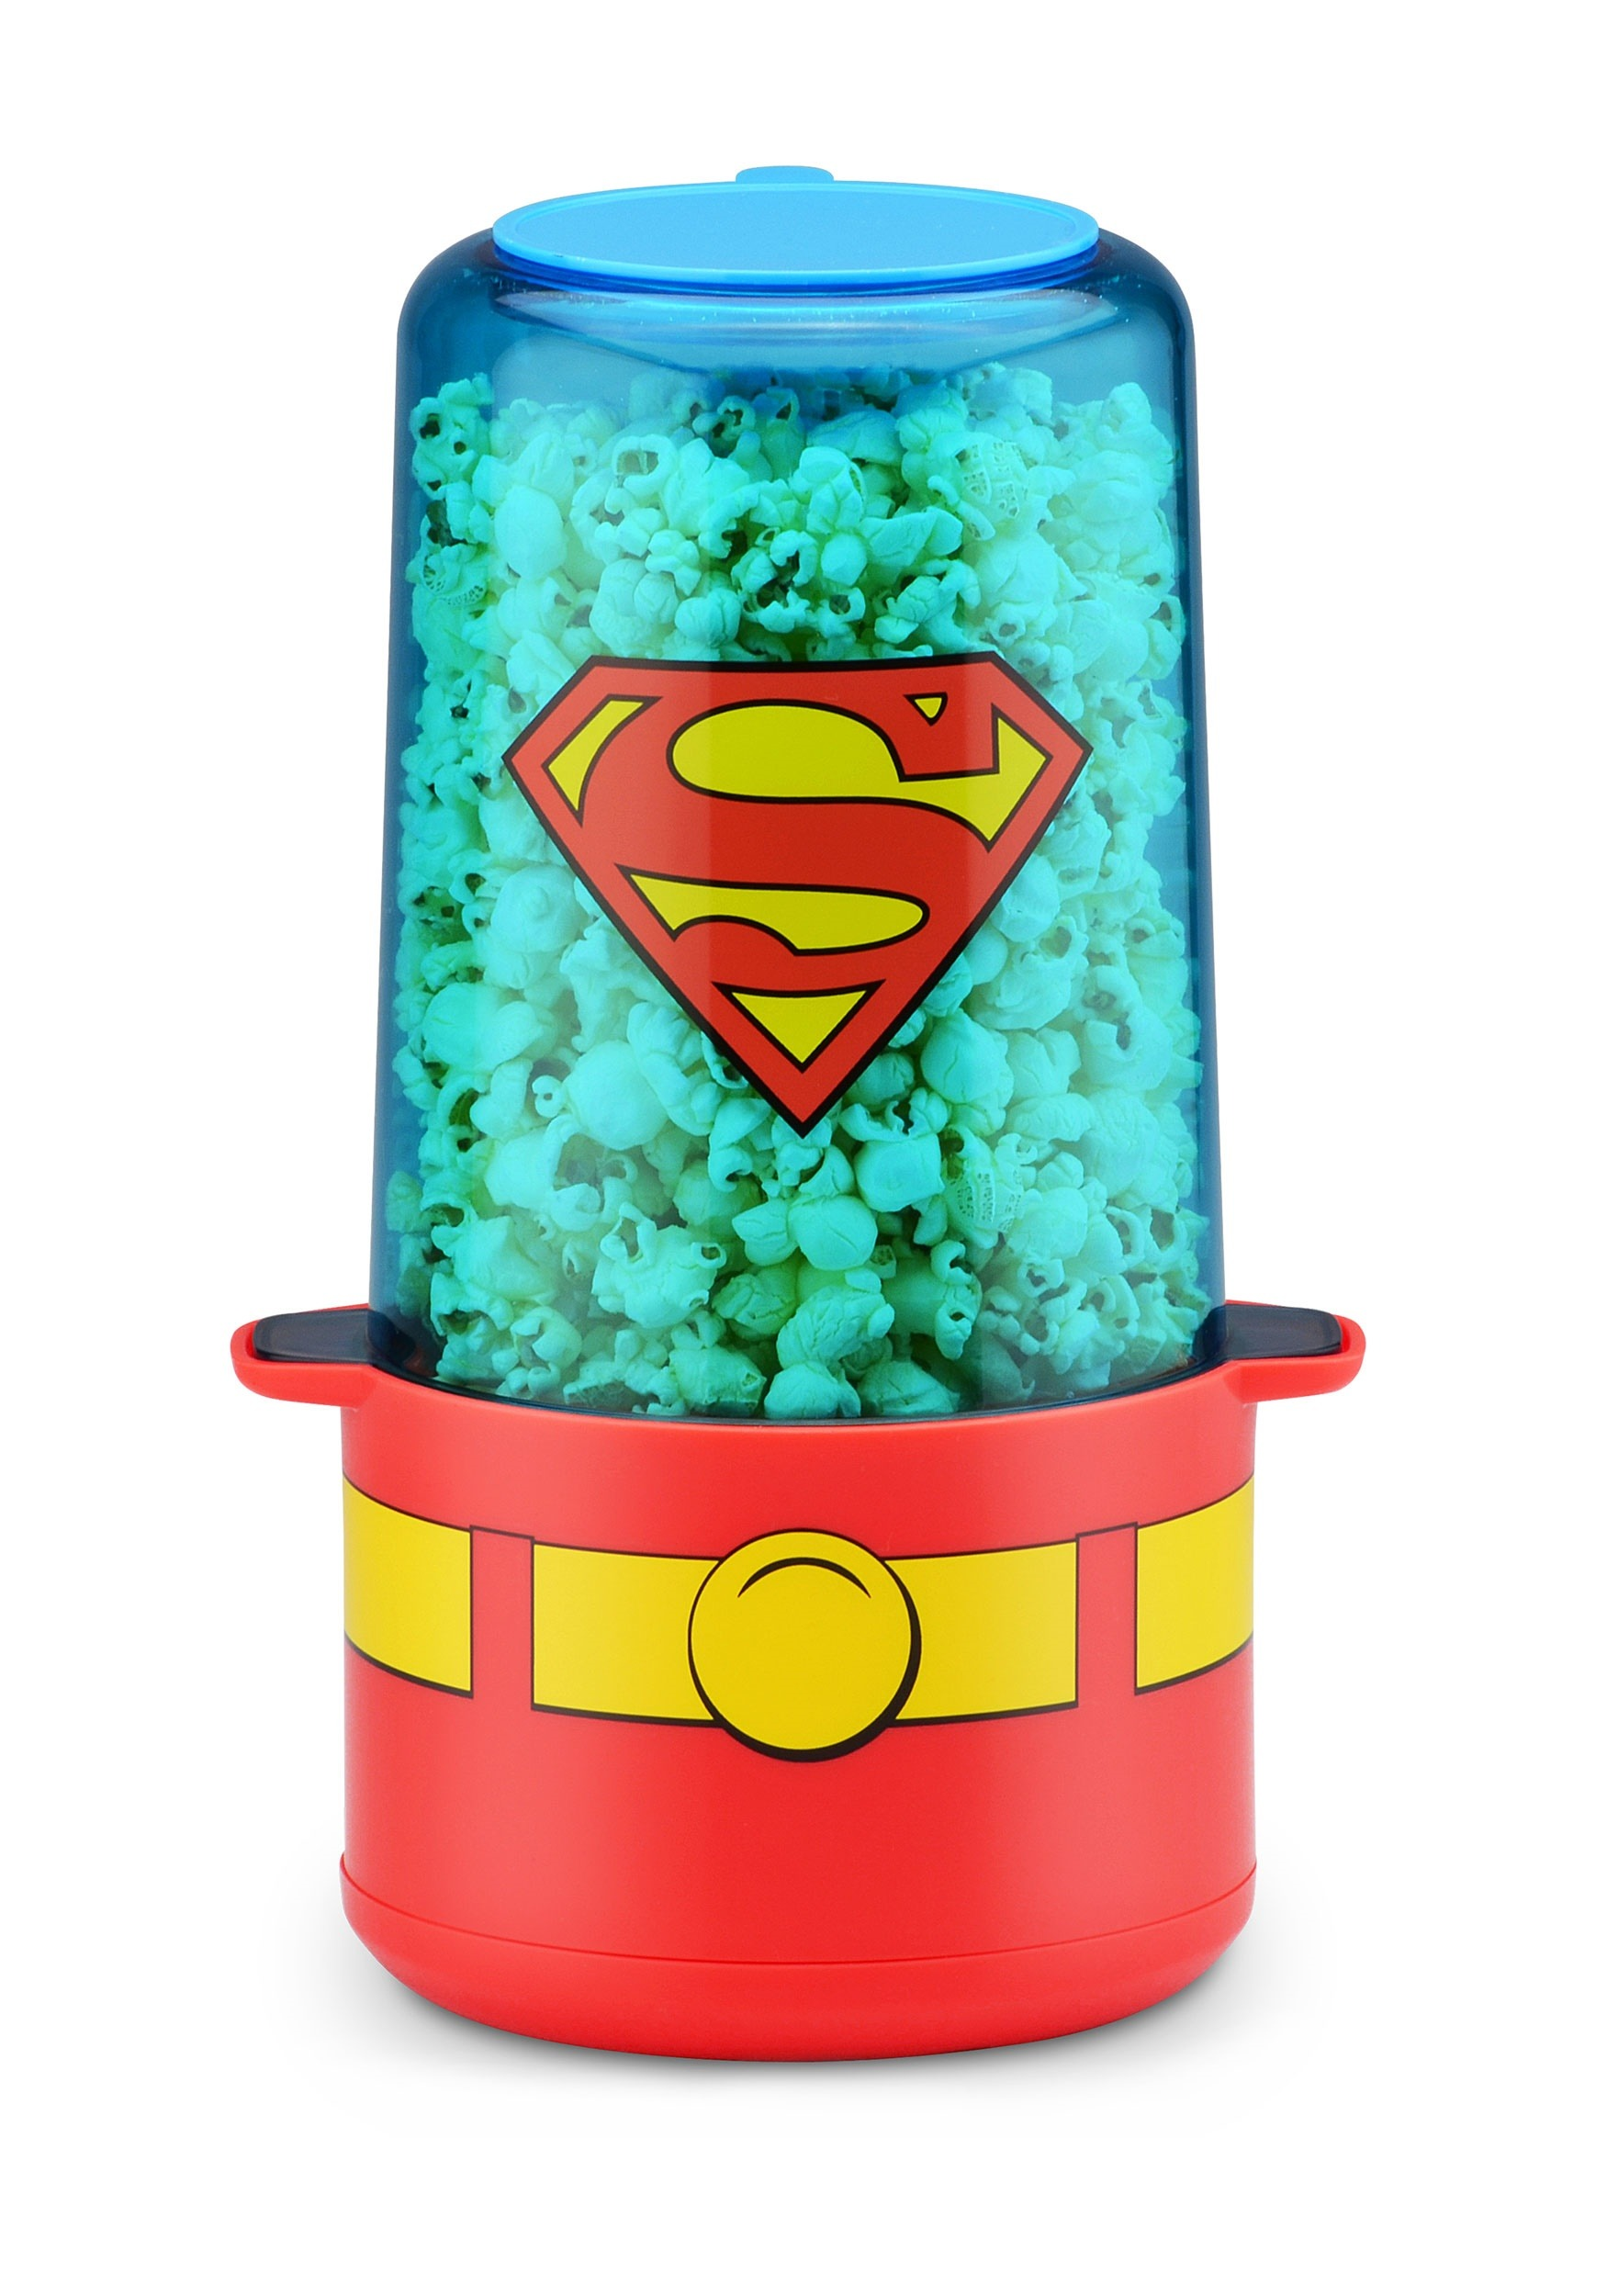 Mini Stir Superman Themed Popcorn Maker